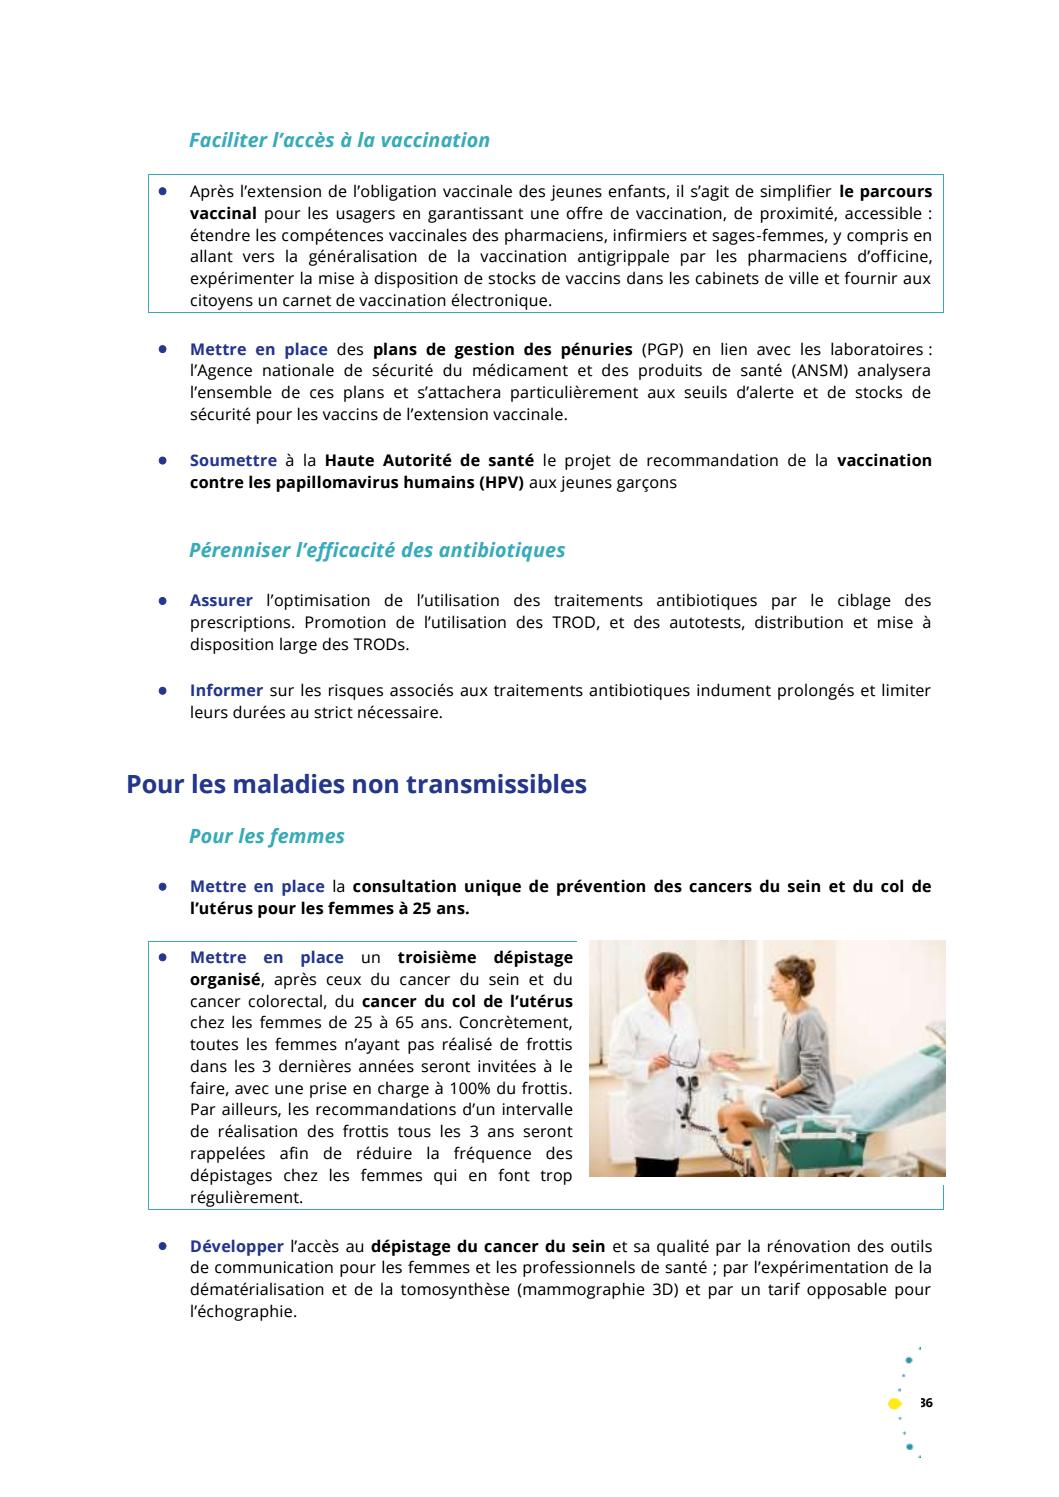 papillomavirus et antibiotiques hpv scaly skin